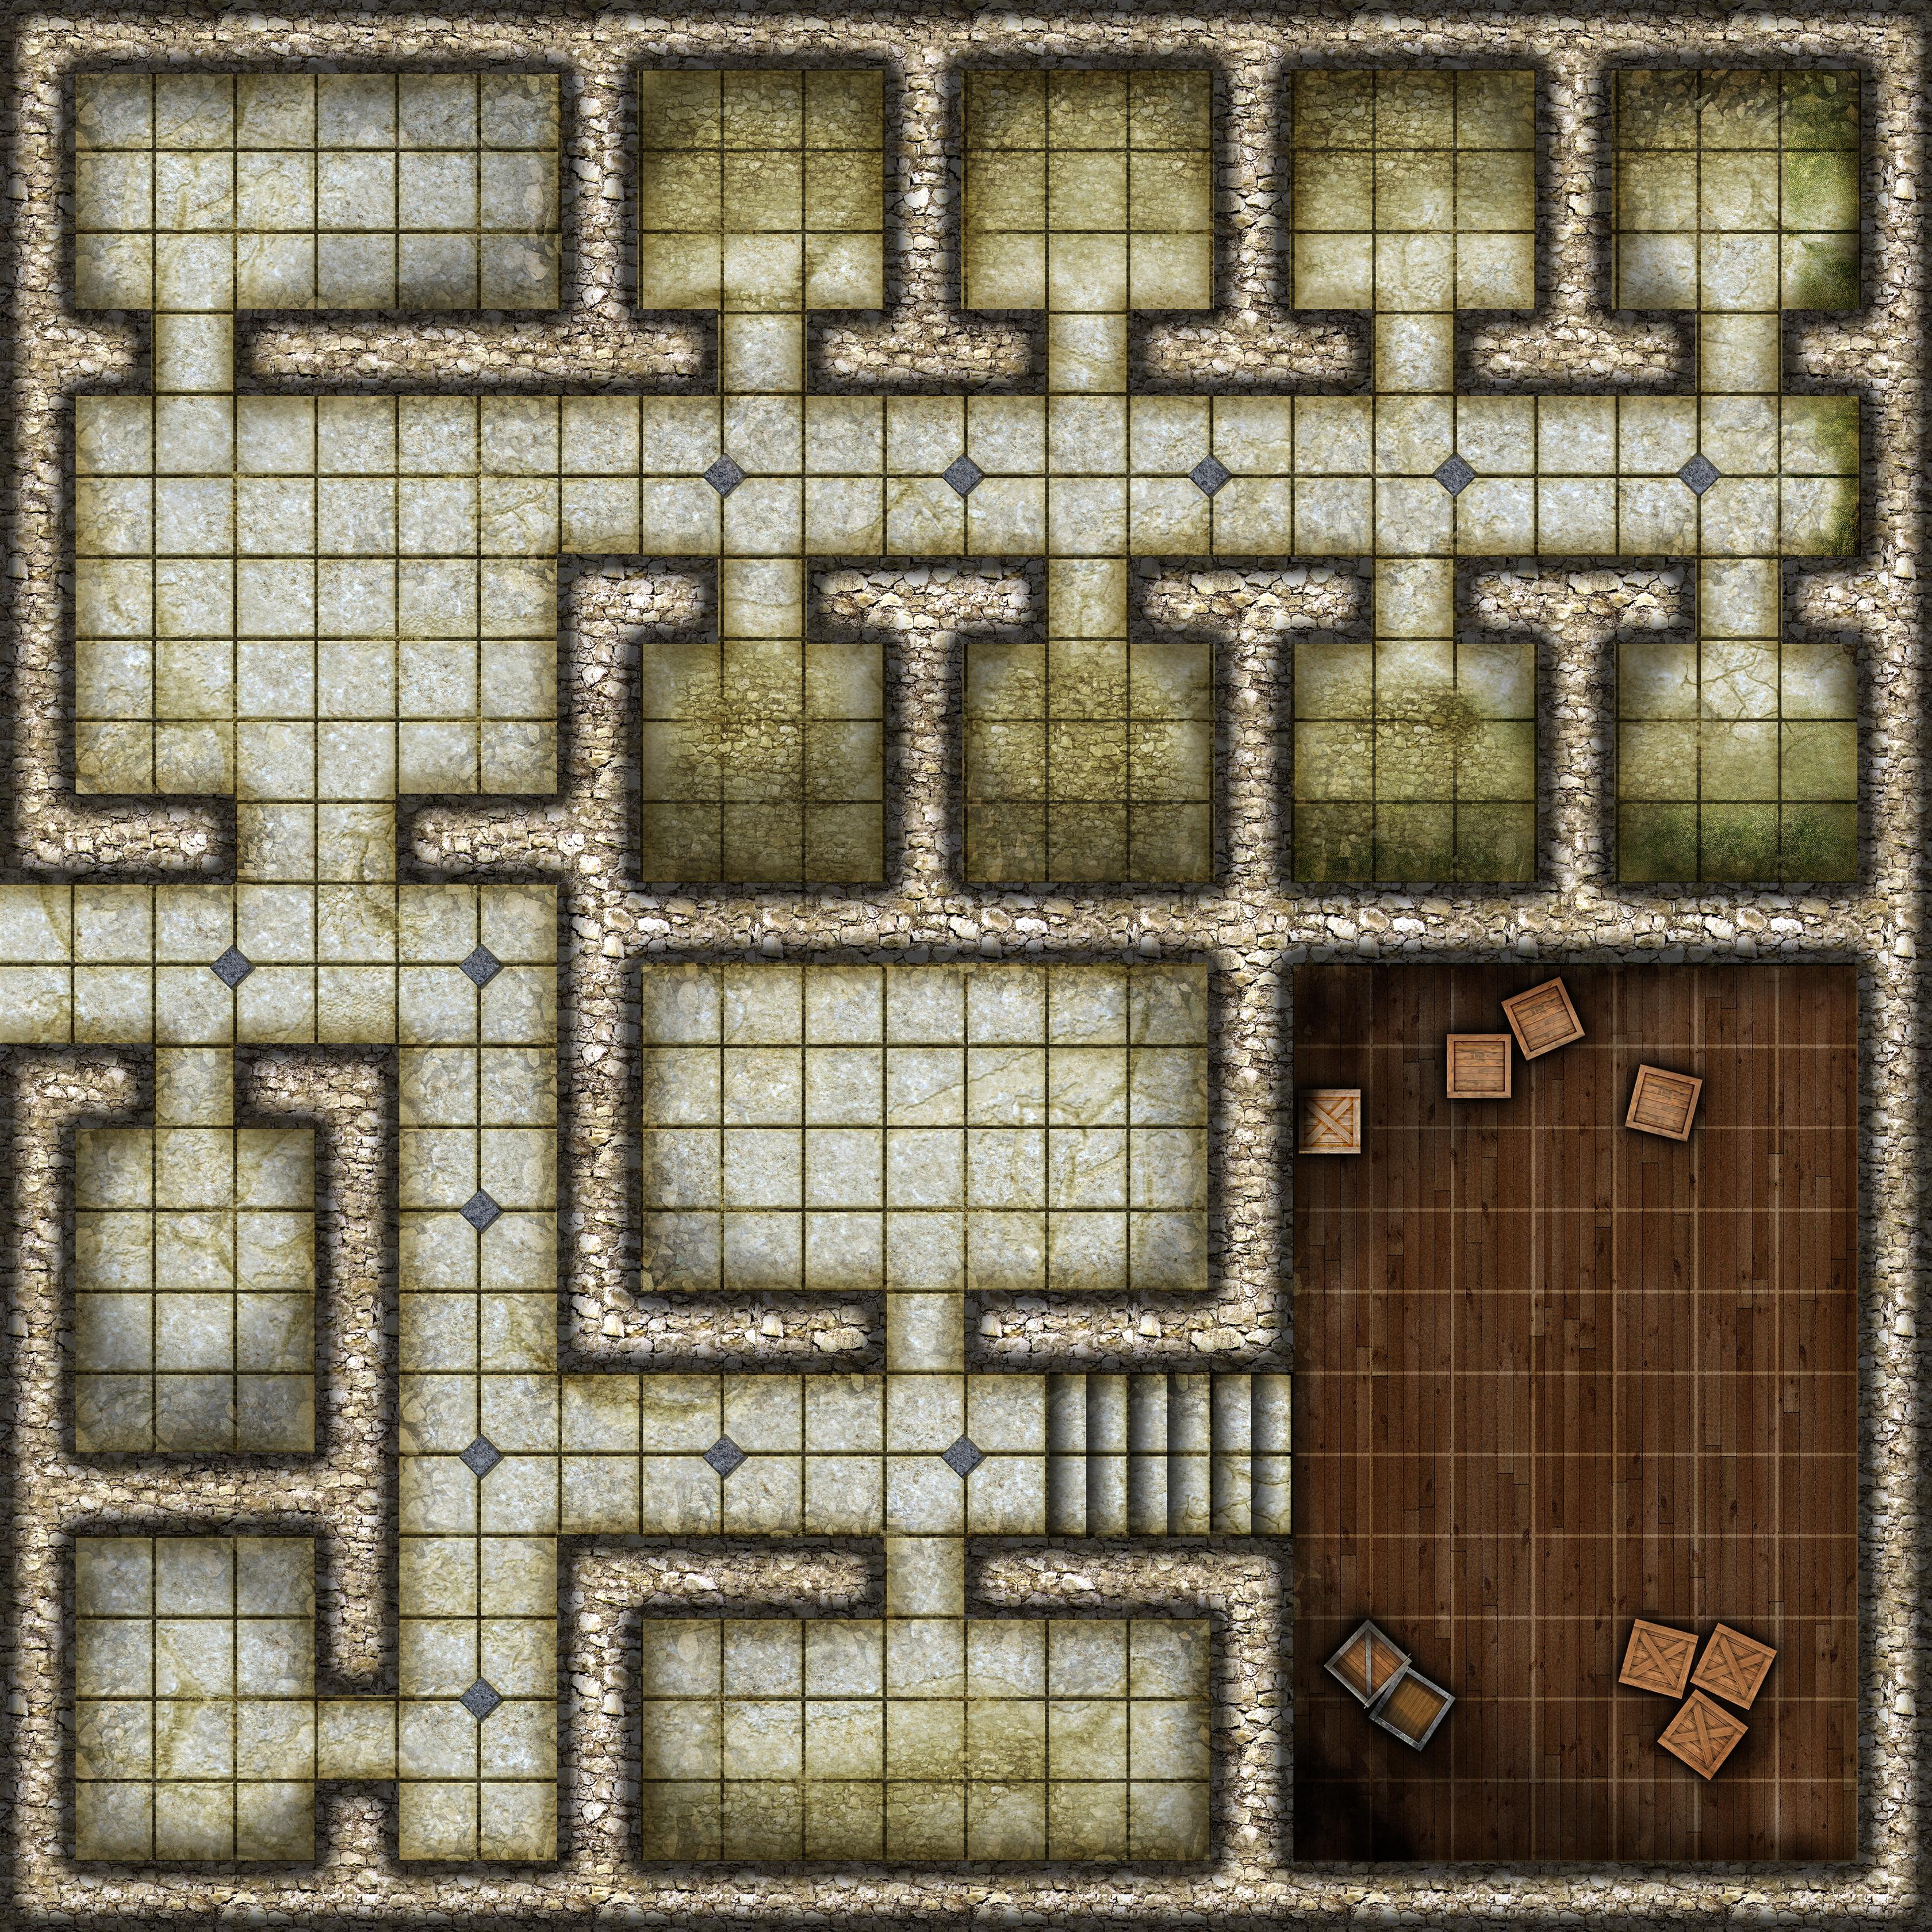 Dugeon-Cells-24x24-1-Square-VTT.jpg